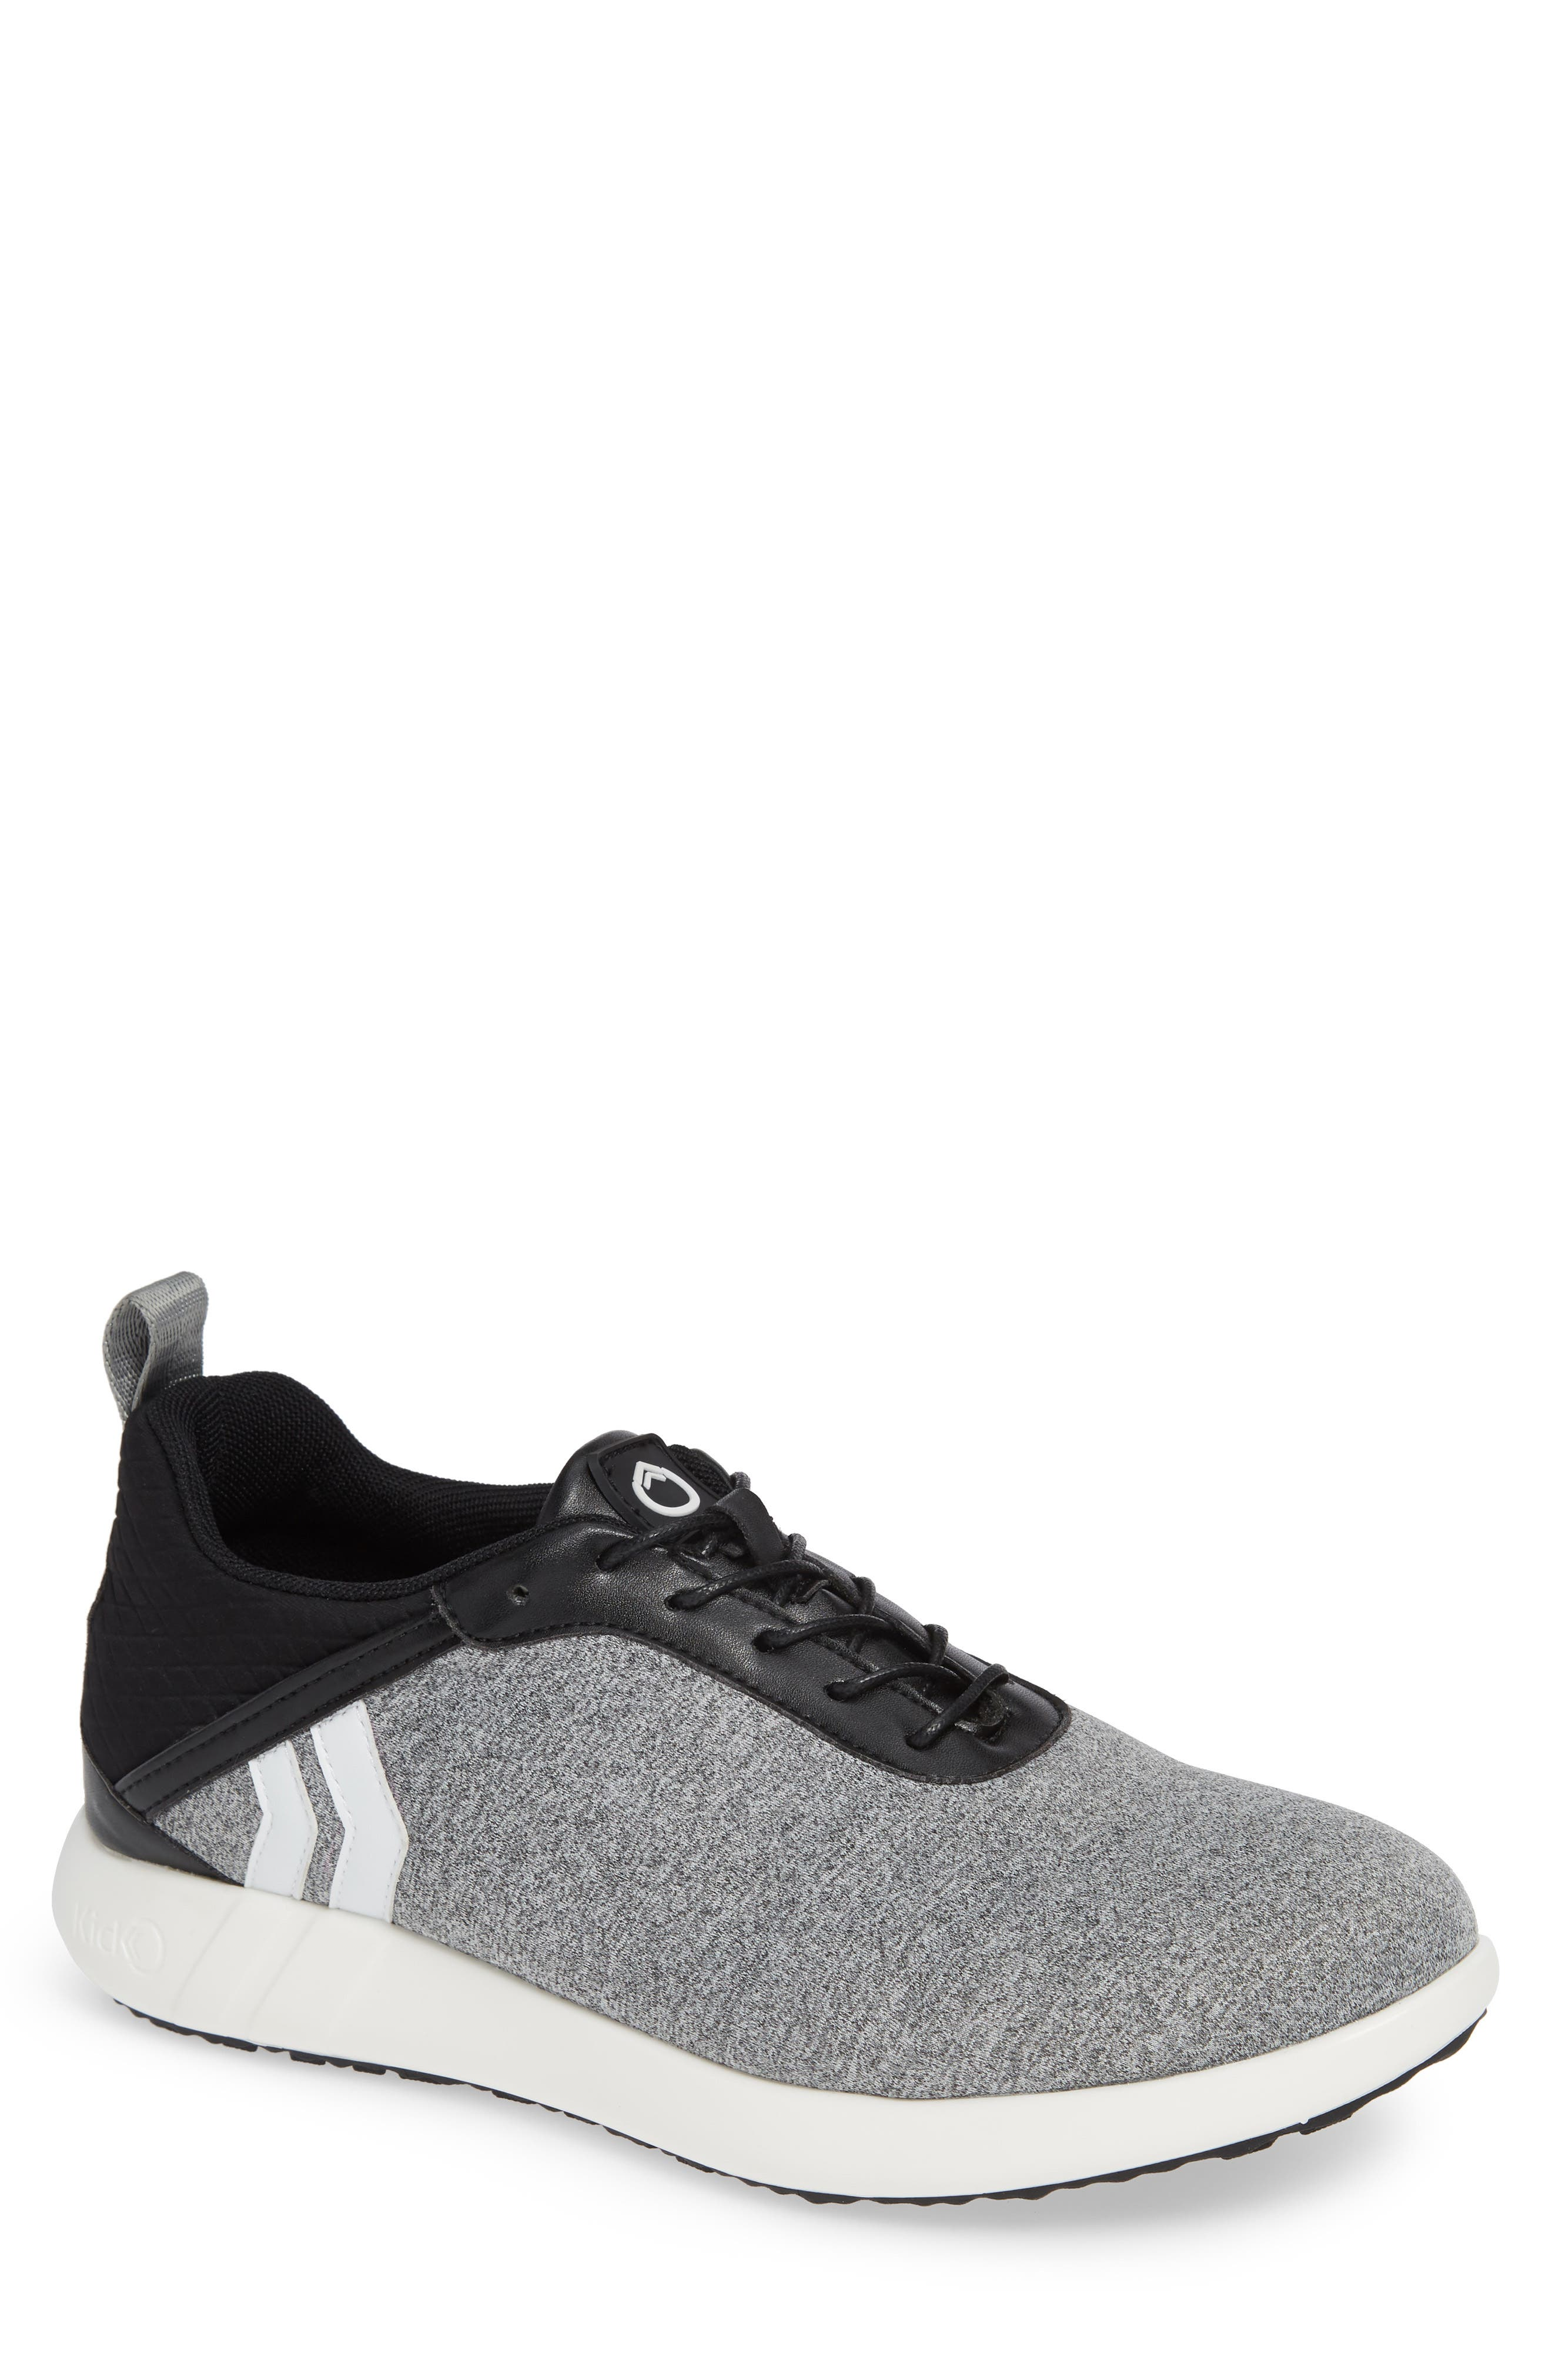 Avalon Sneaker,                             Main thumbnail 1, color,                             GREY FABRIC